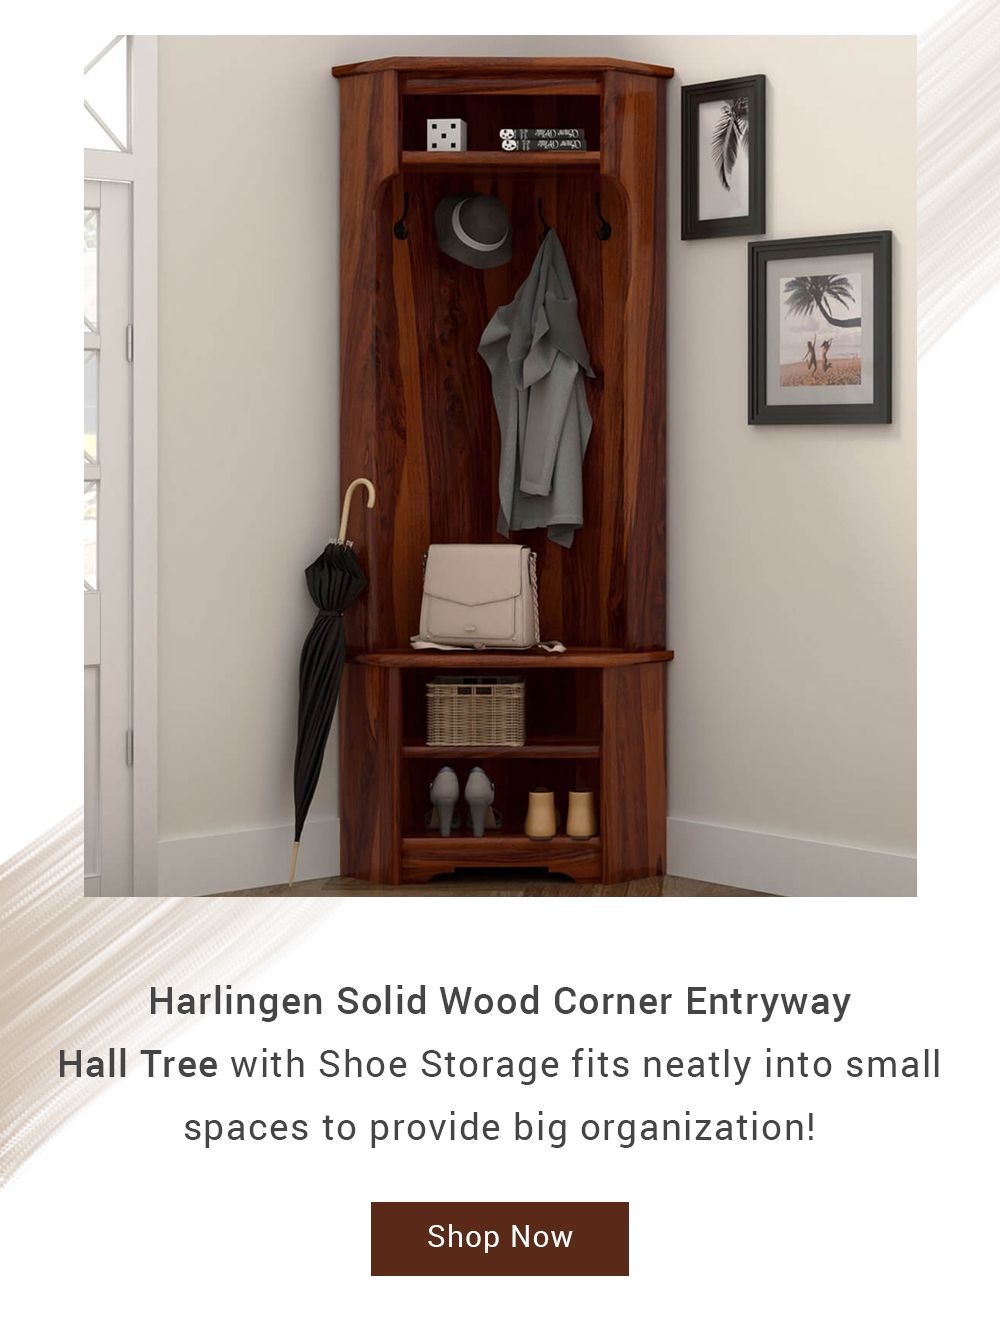 Harlingen Rustic Solid Wood Corner Entryway Hall Tree And Shoe Storage Entryway Hall Tree Hall Tree Hall Tree With Shoe Storage